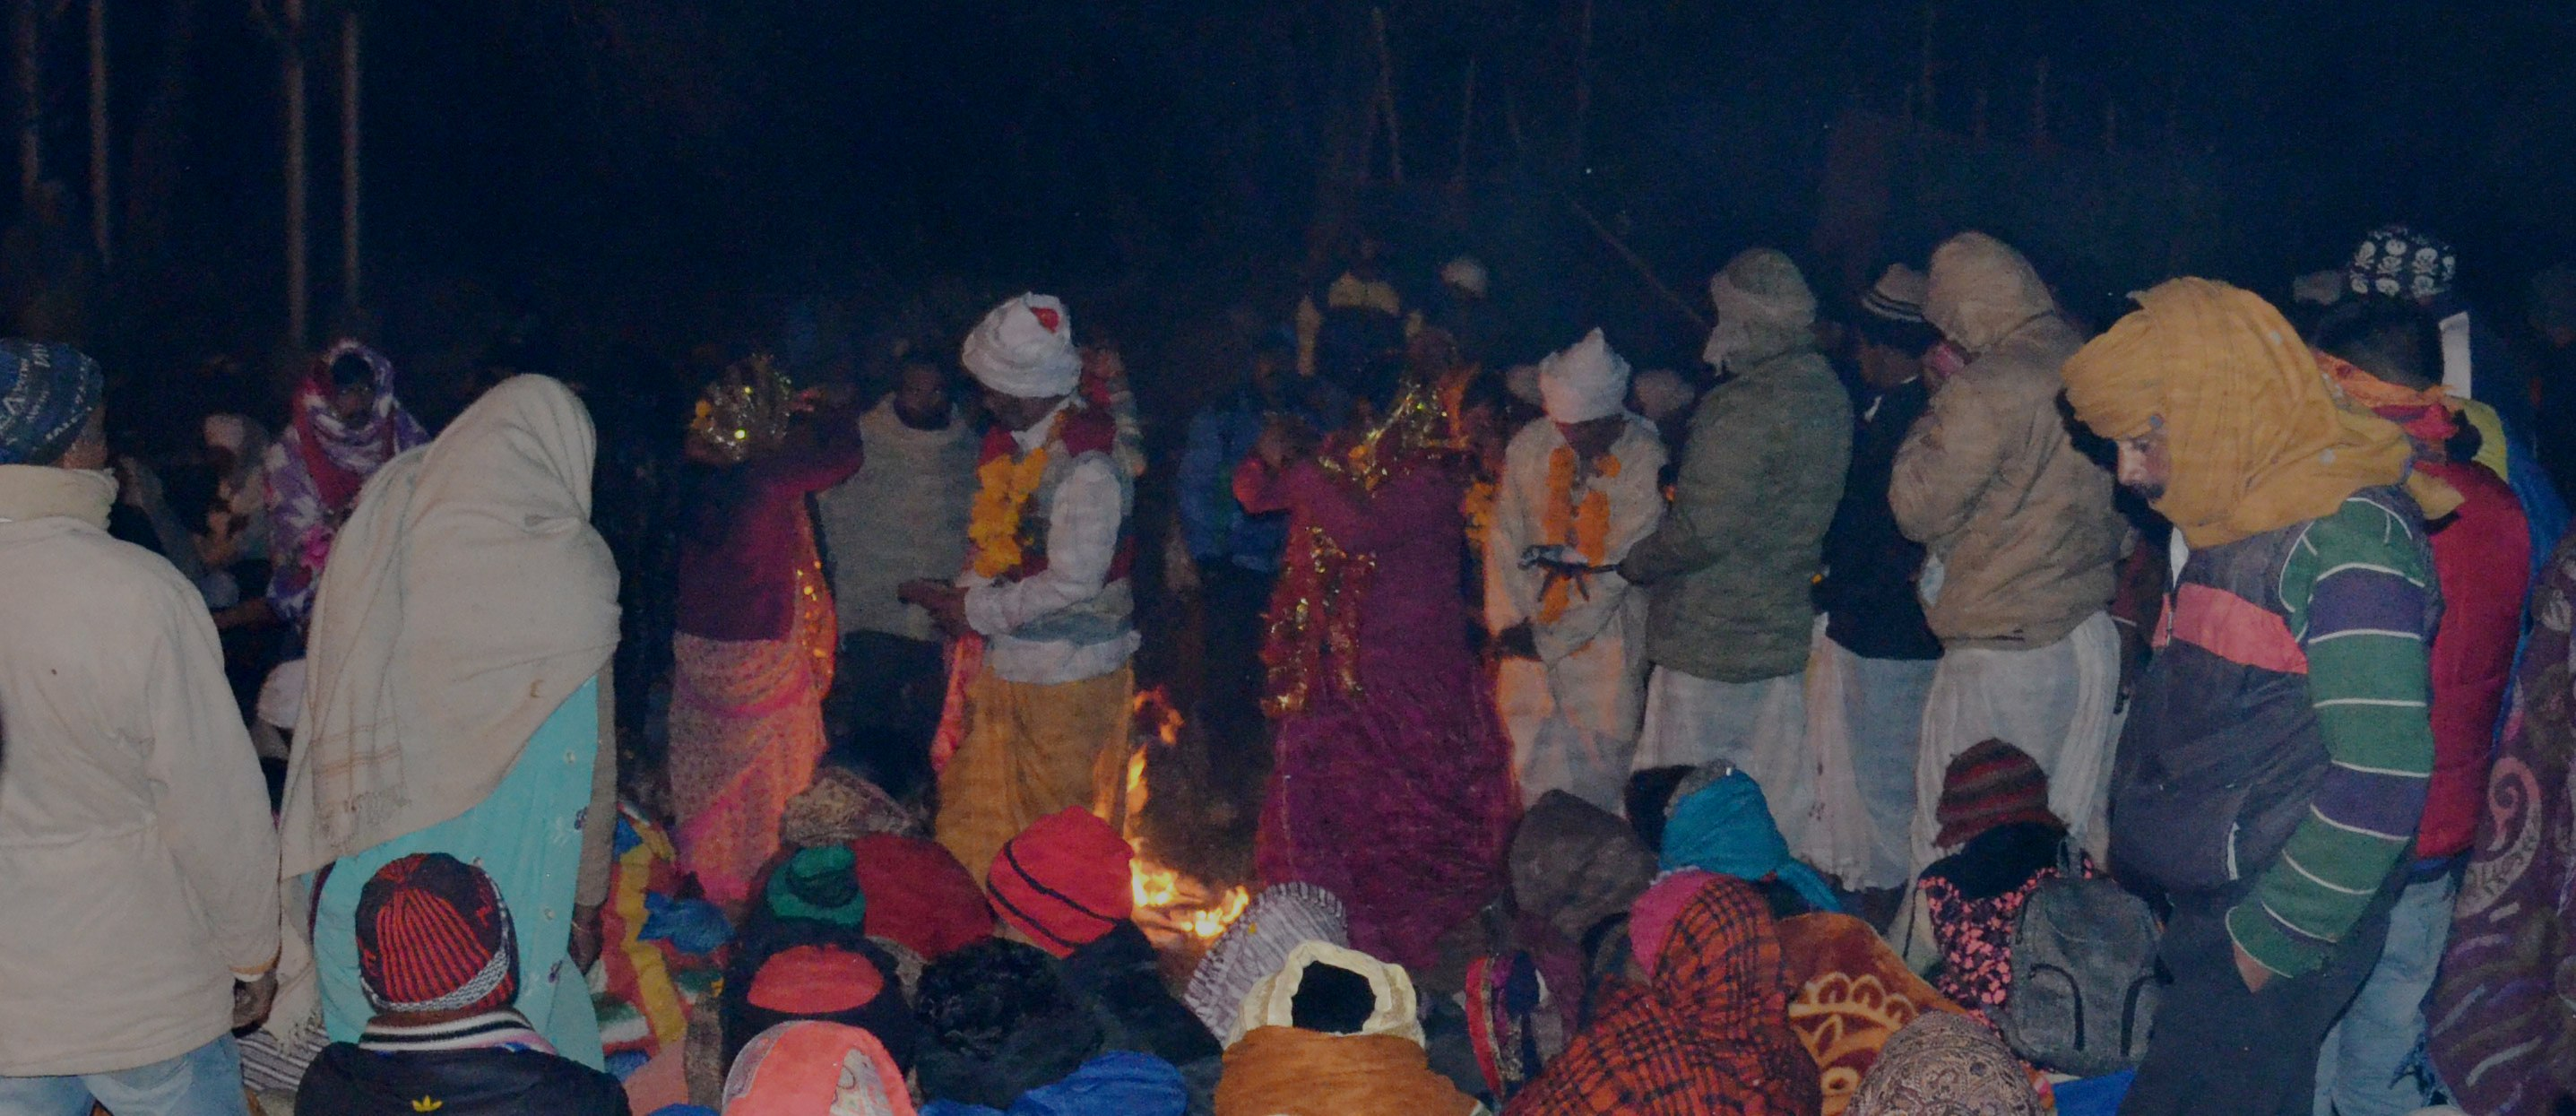 Jiarani, katyooree Dynasty, जियारानी, कत्यूरी वंश, Jia Rani, uttarakhand culture,